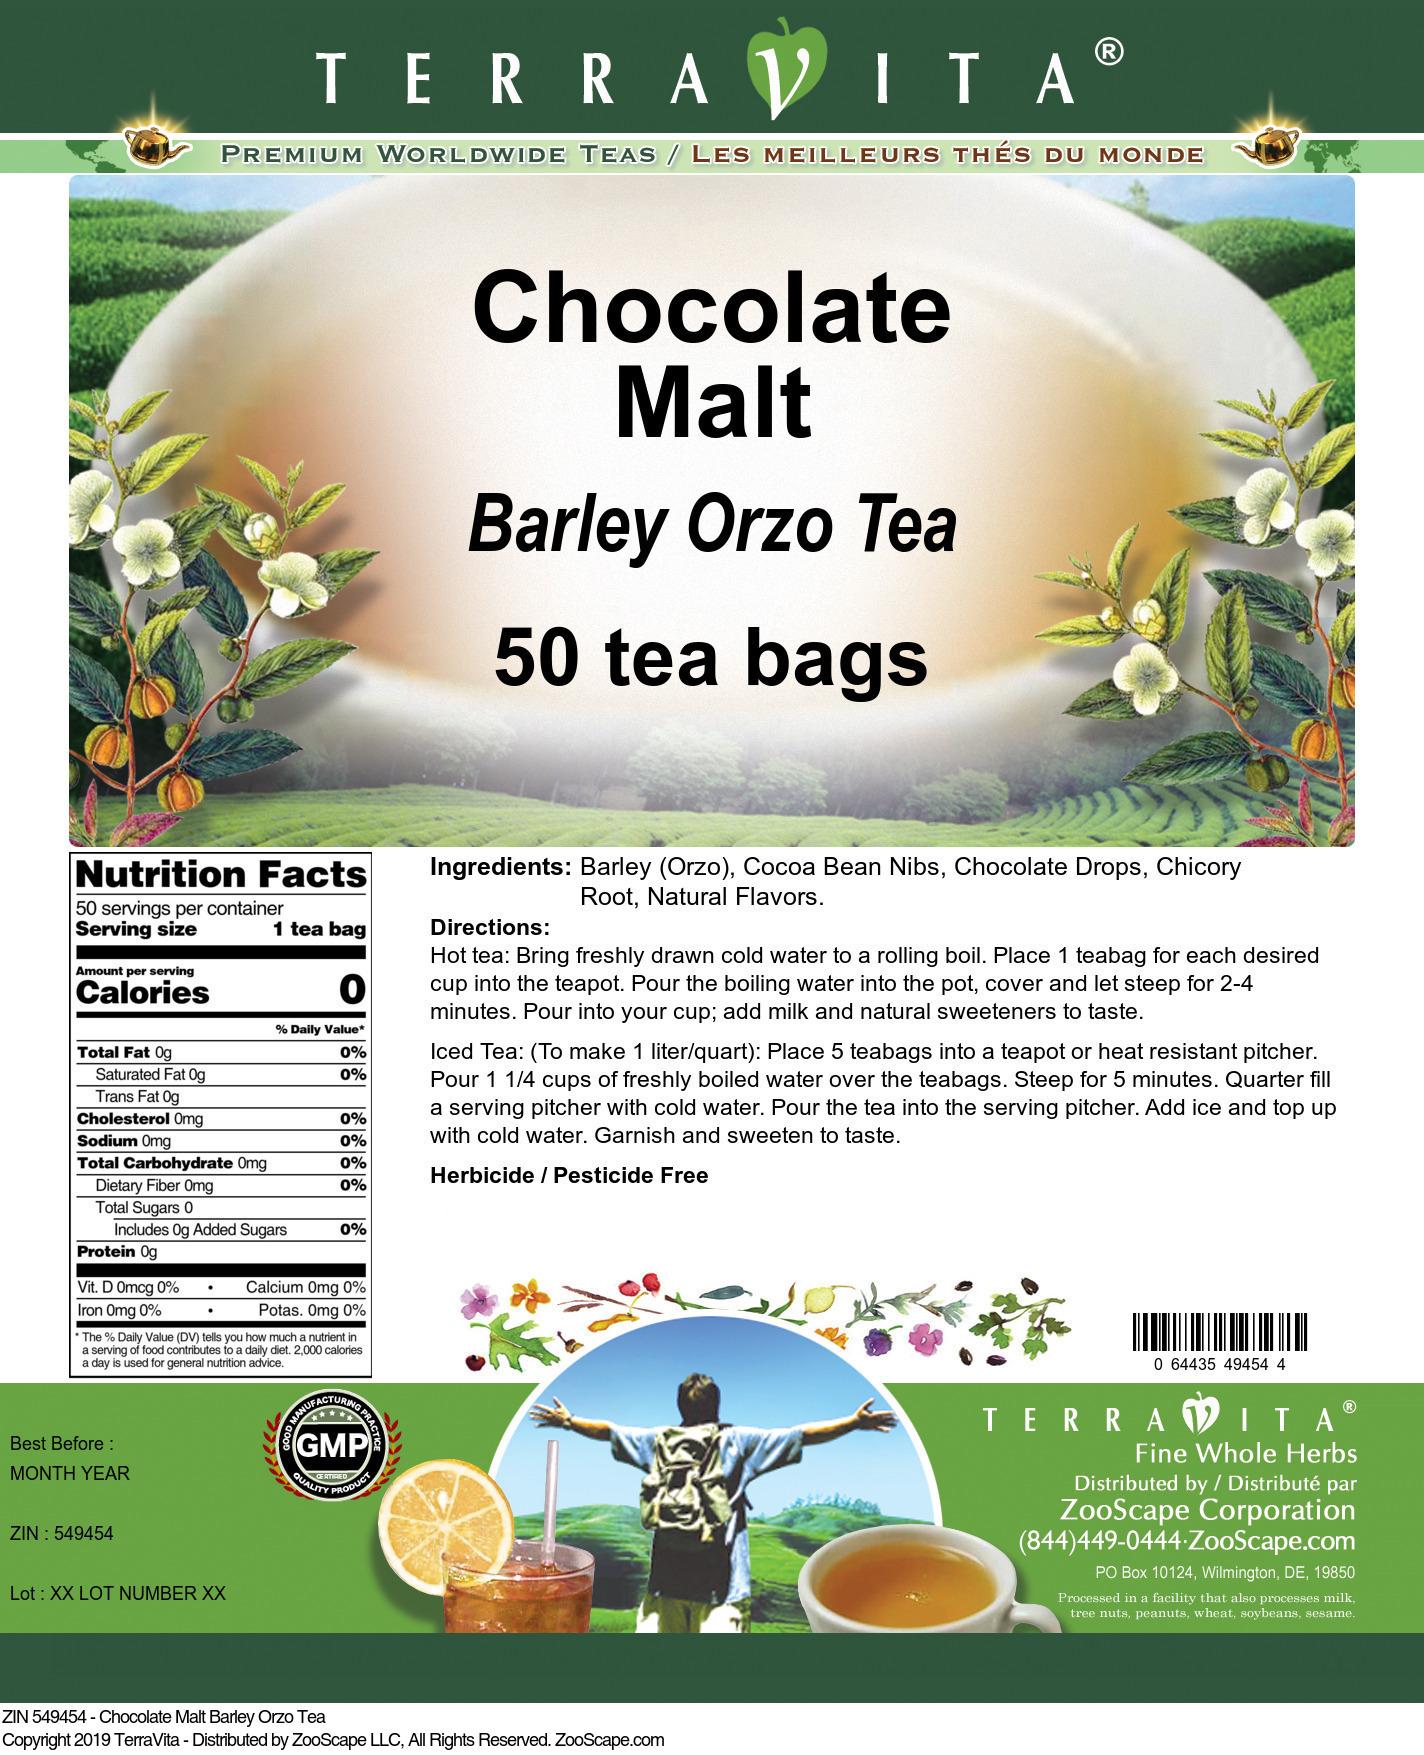 Chocolate Malt Barley Orzo Tea